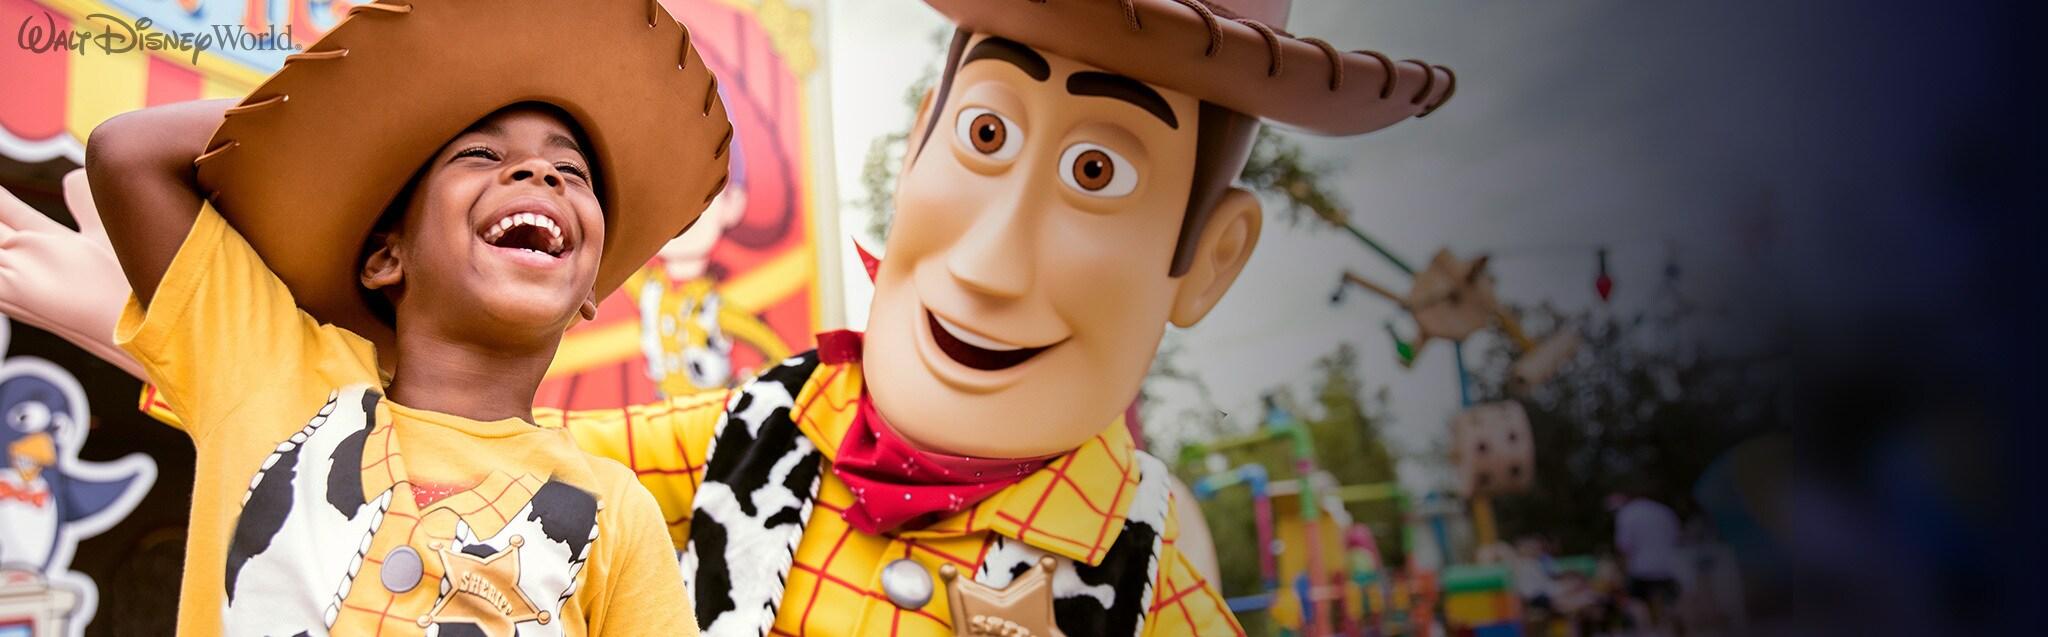 Walt Disney World Offer